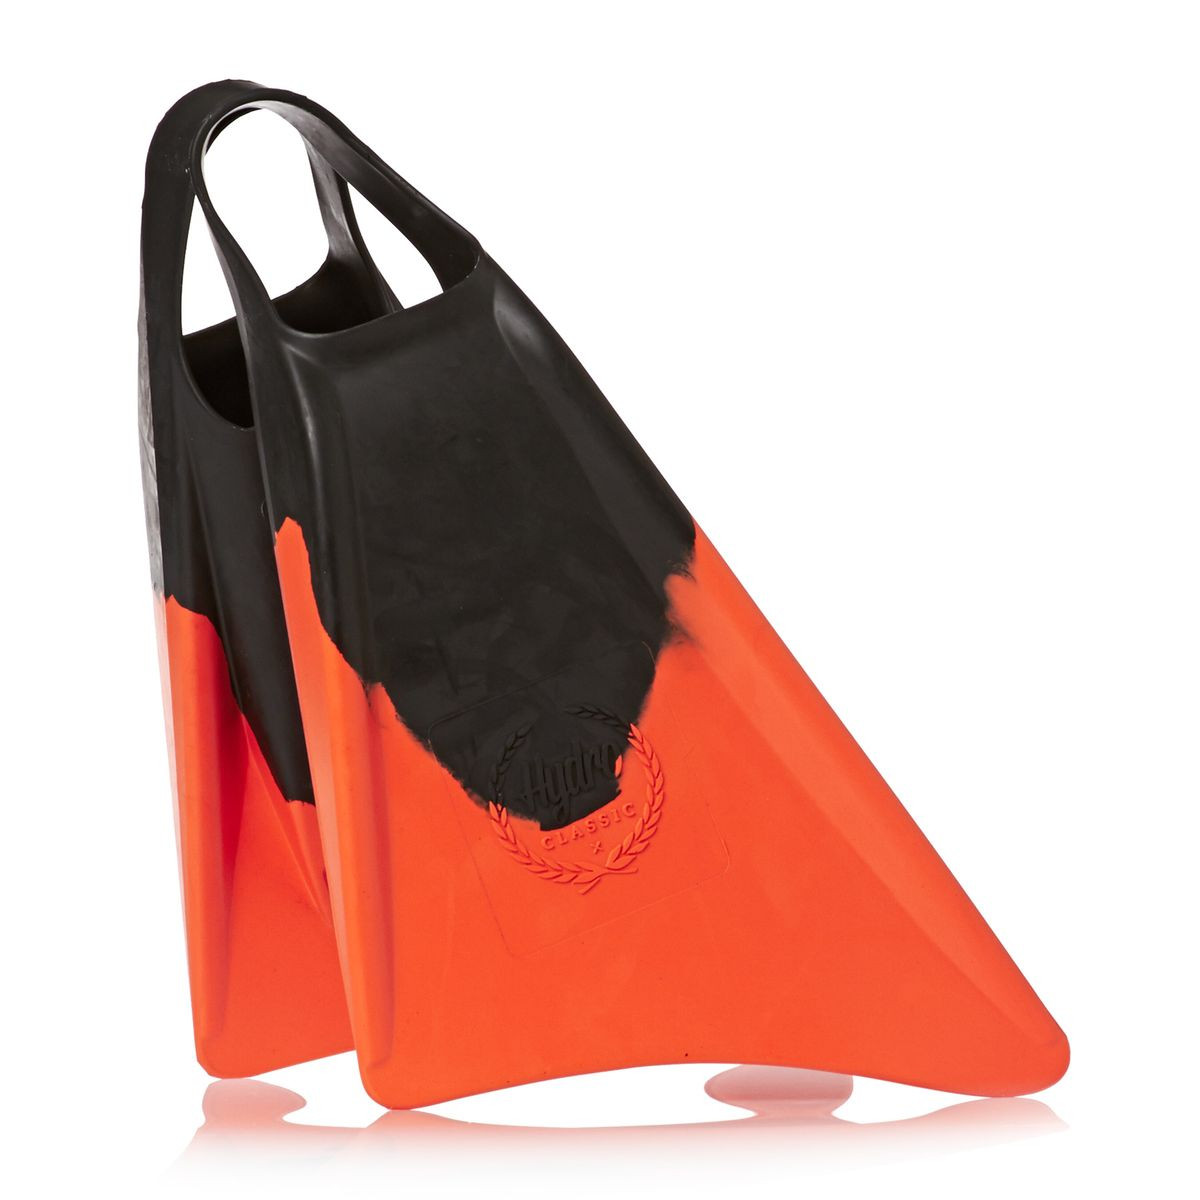 Hydro Classic Bodyboard Fins - Black/ Orange